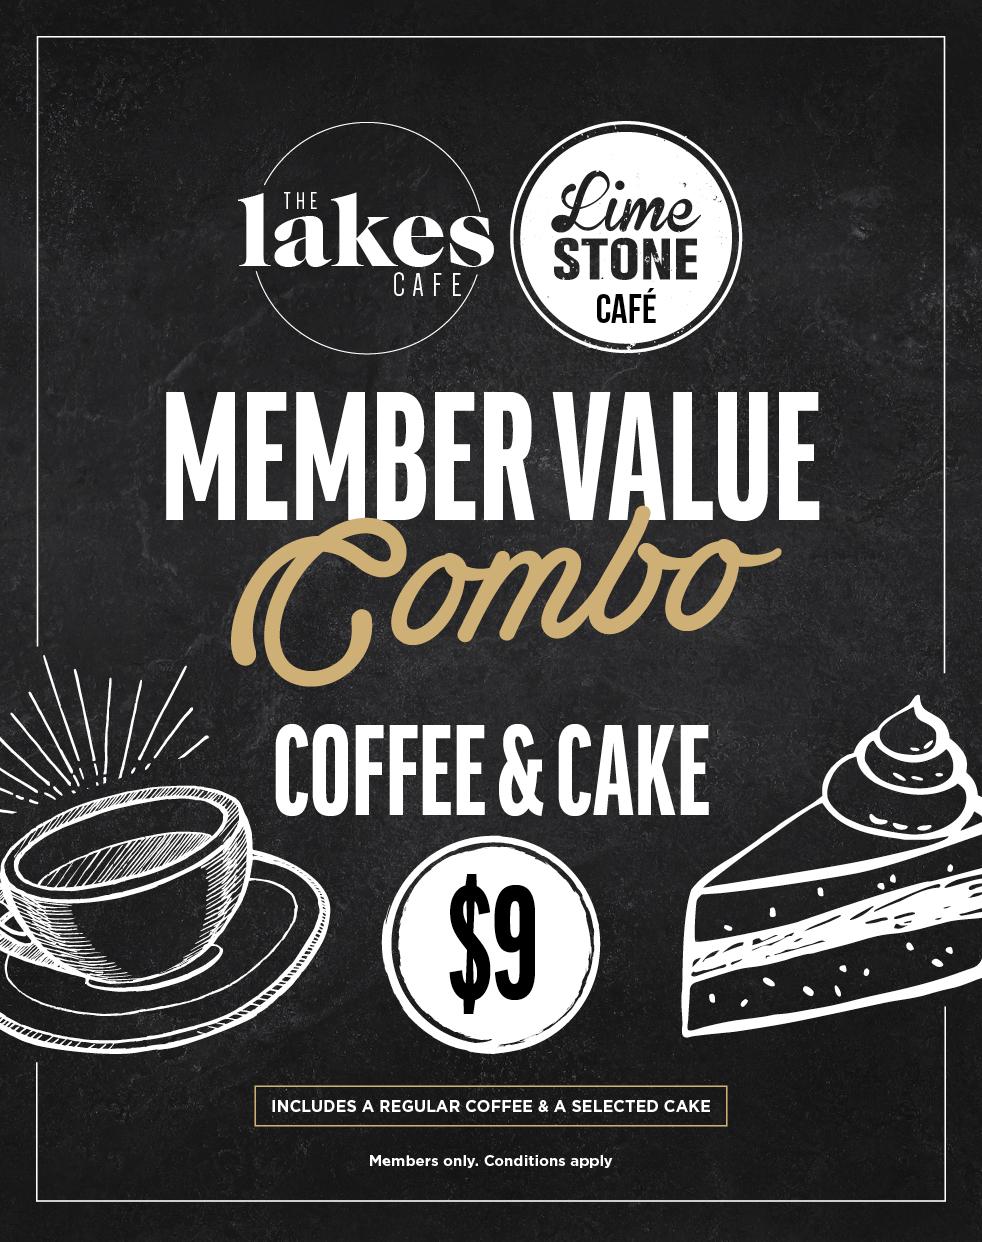 $9 Coffee & Cake Combo